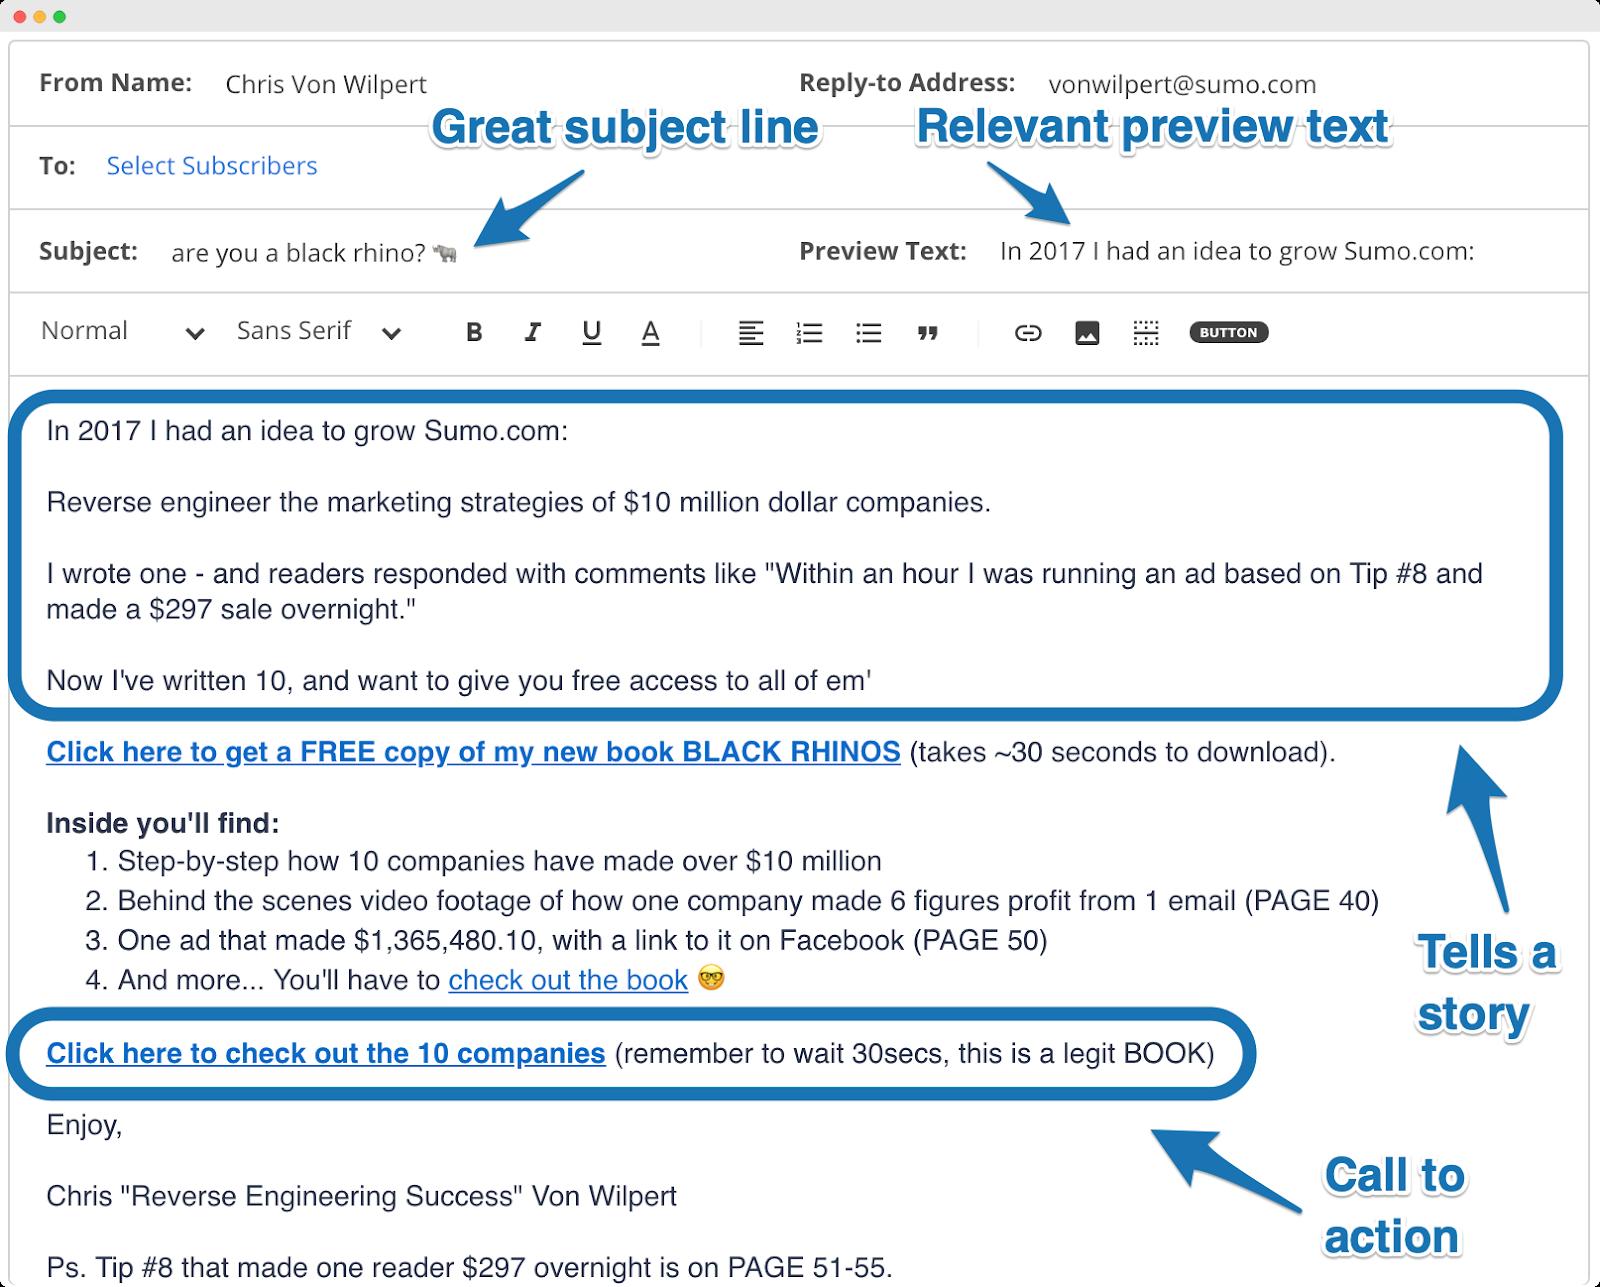 Screenshot of good email format